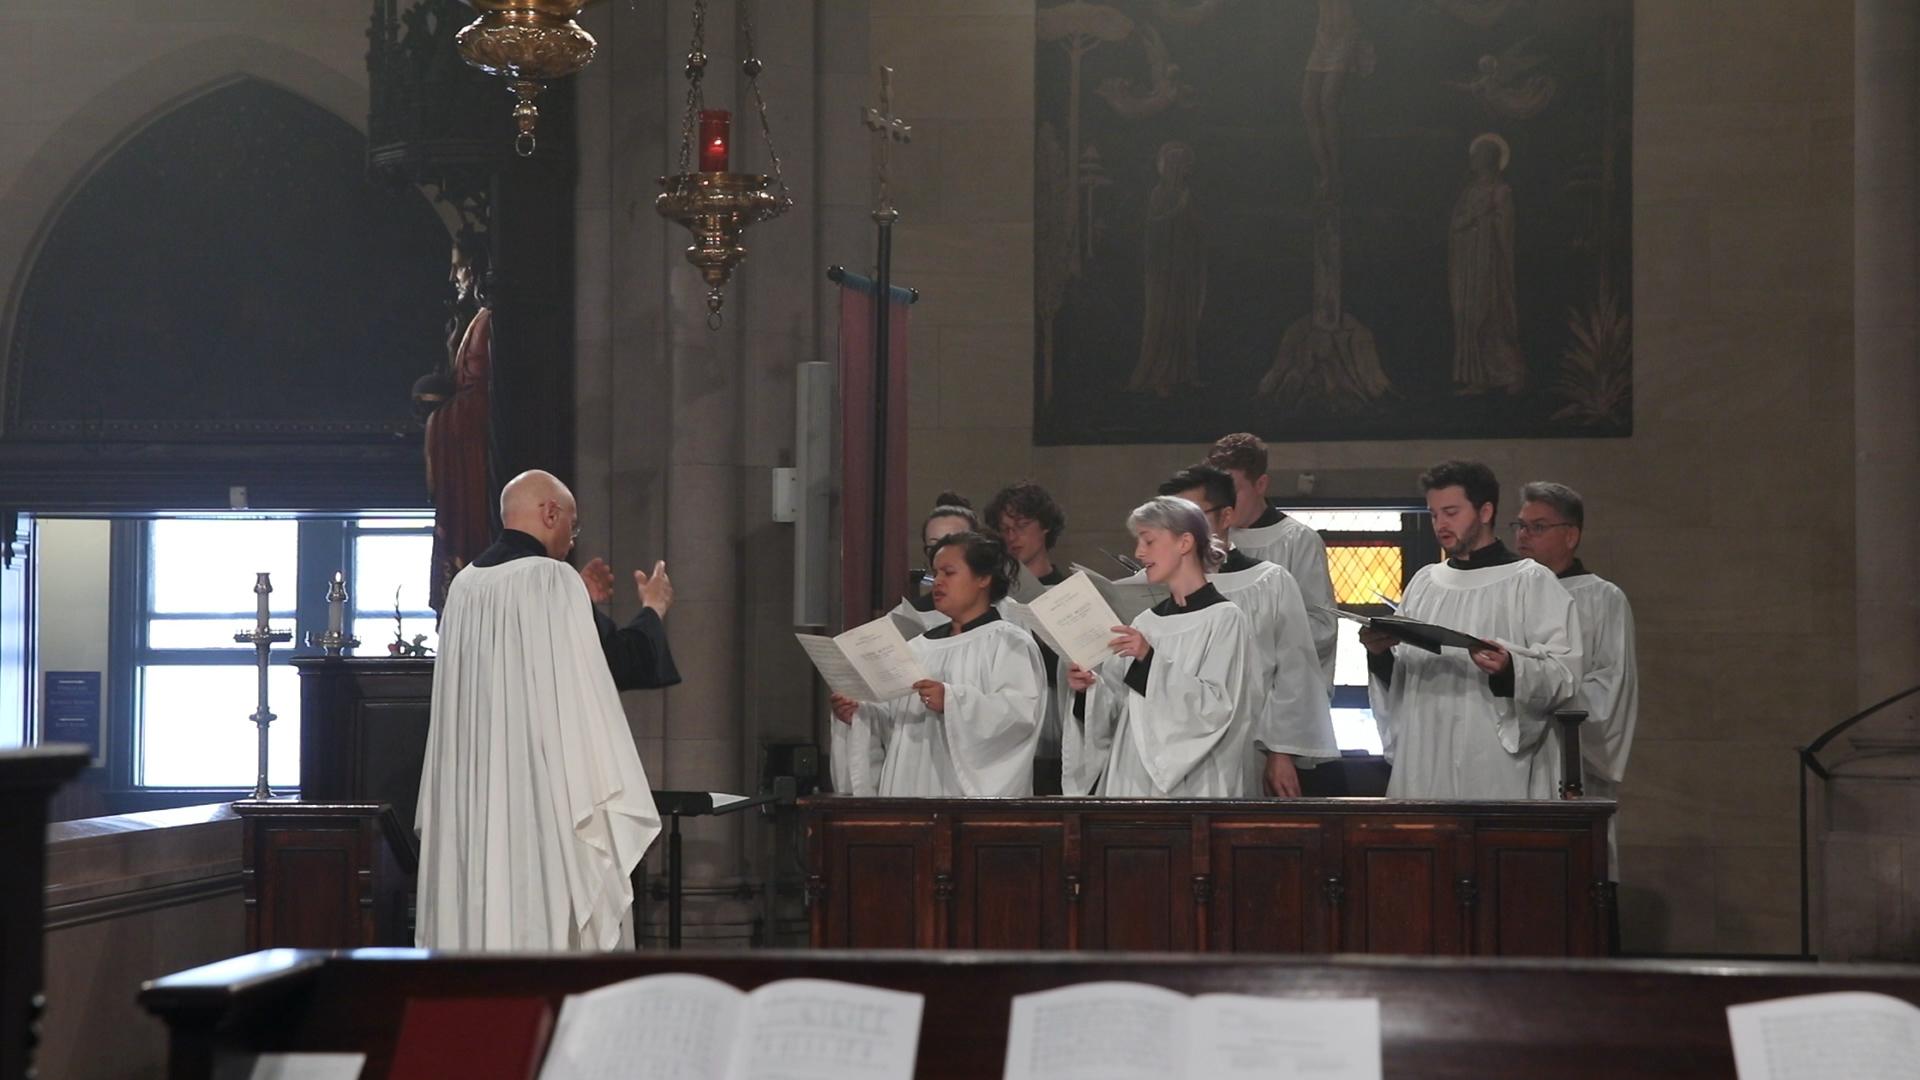 During Benediction, the choir sang a setting of  Tantum ergo  by Maurice Duruflé (1902-1986).  Photo: Pamela Pasco